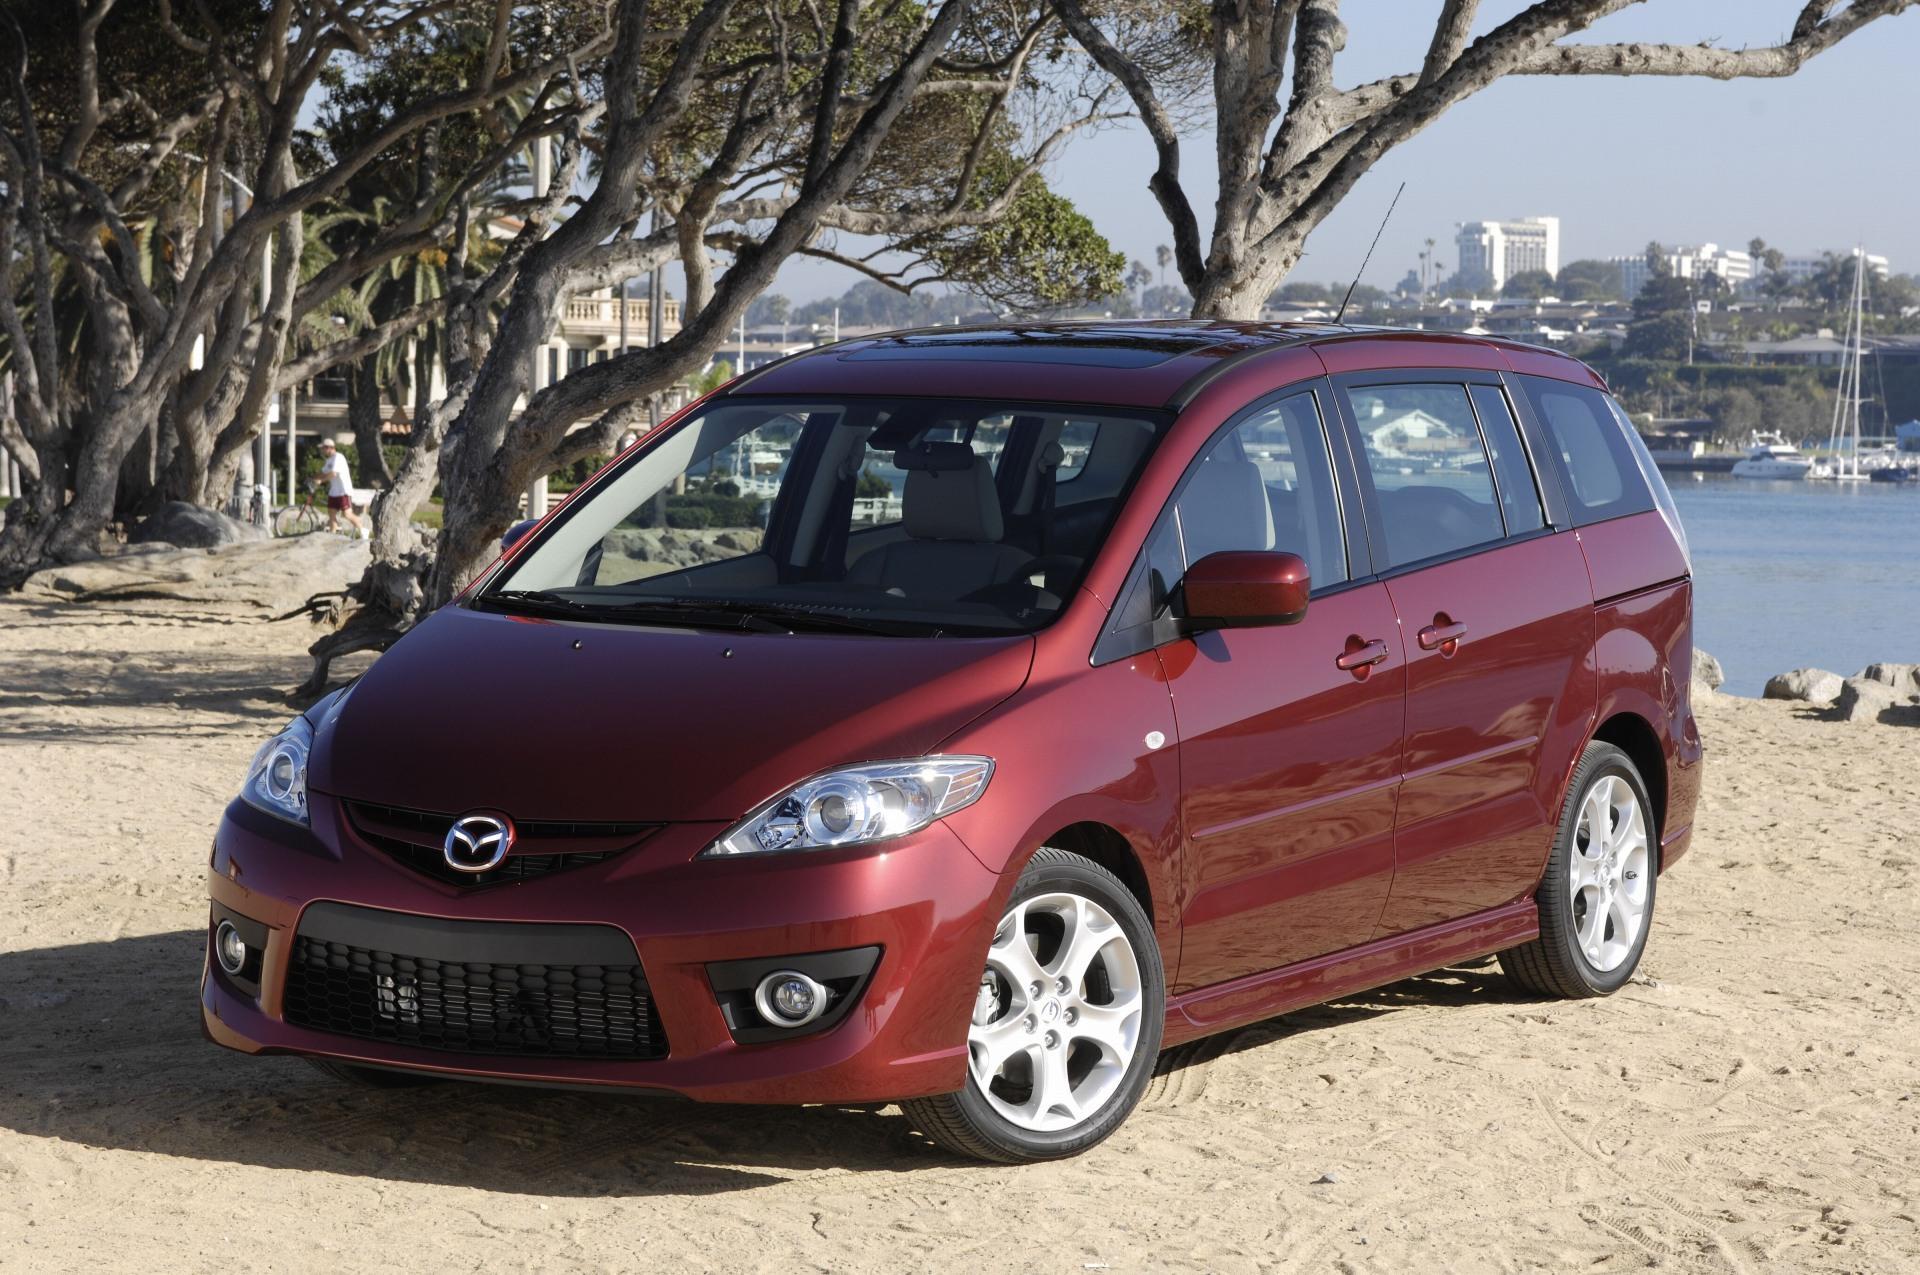 Kelebihan Mazda 5 2009 Spesifikasi